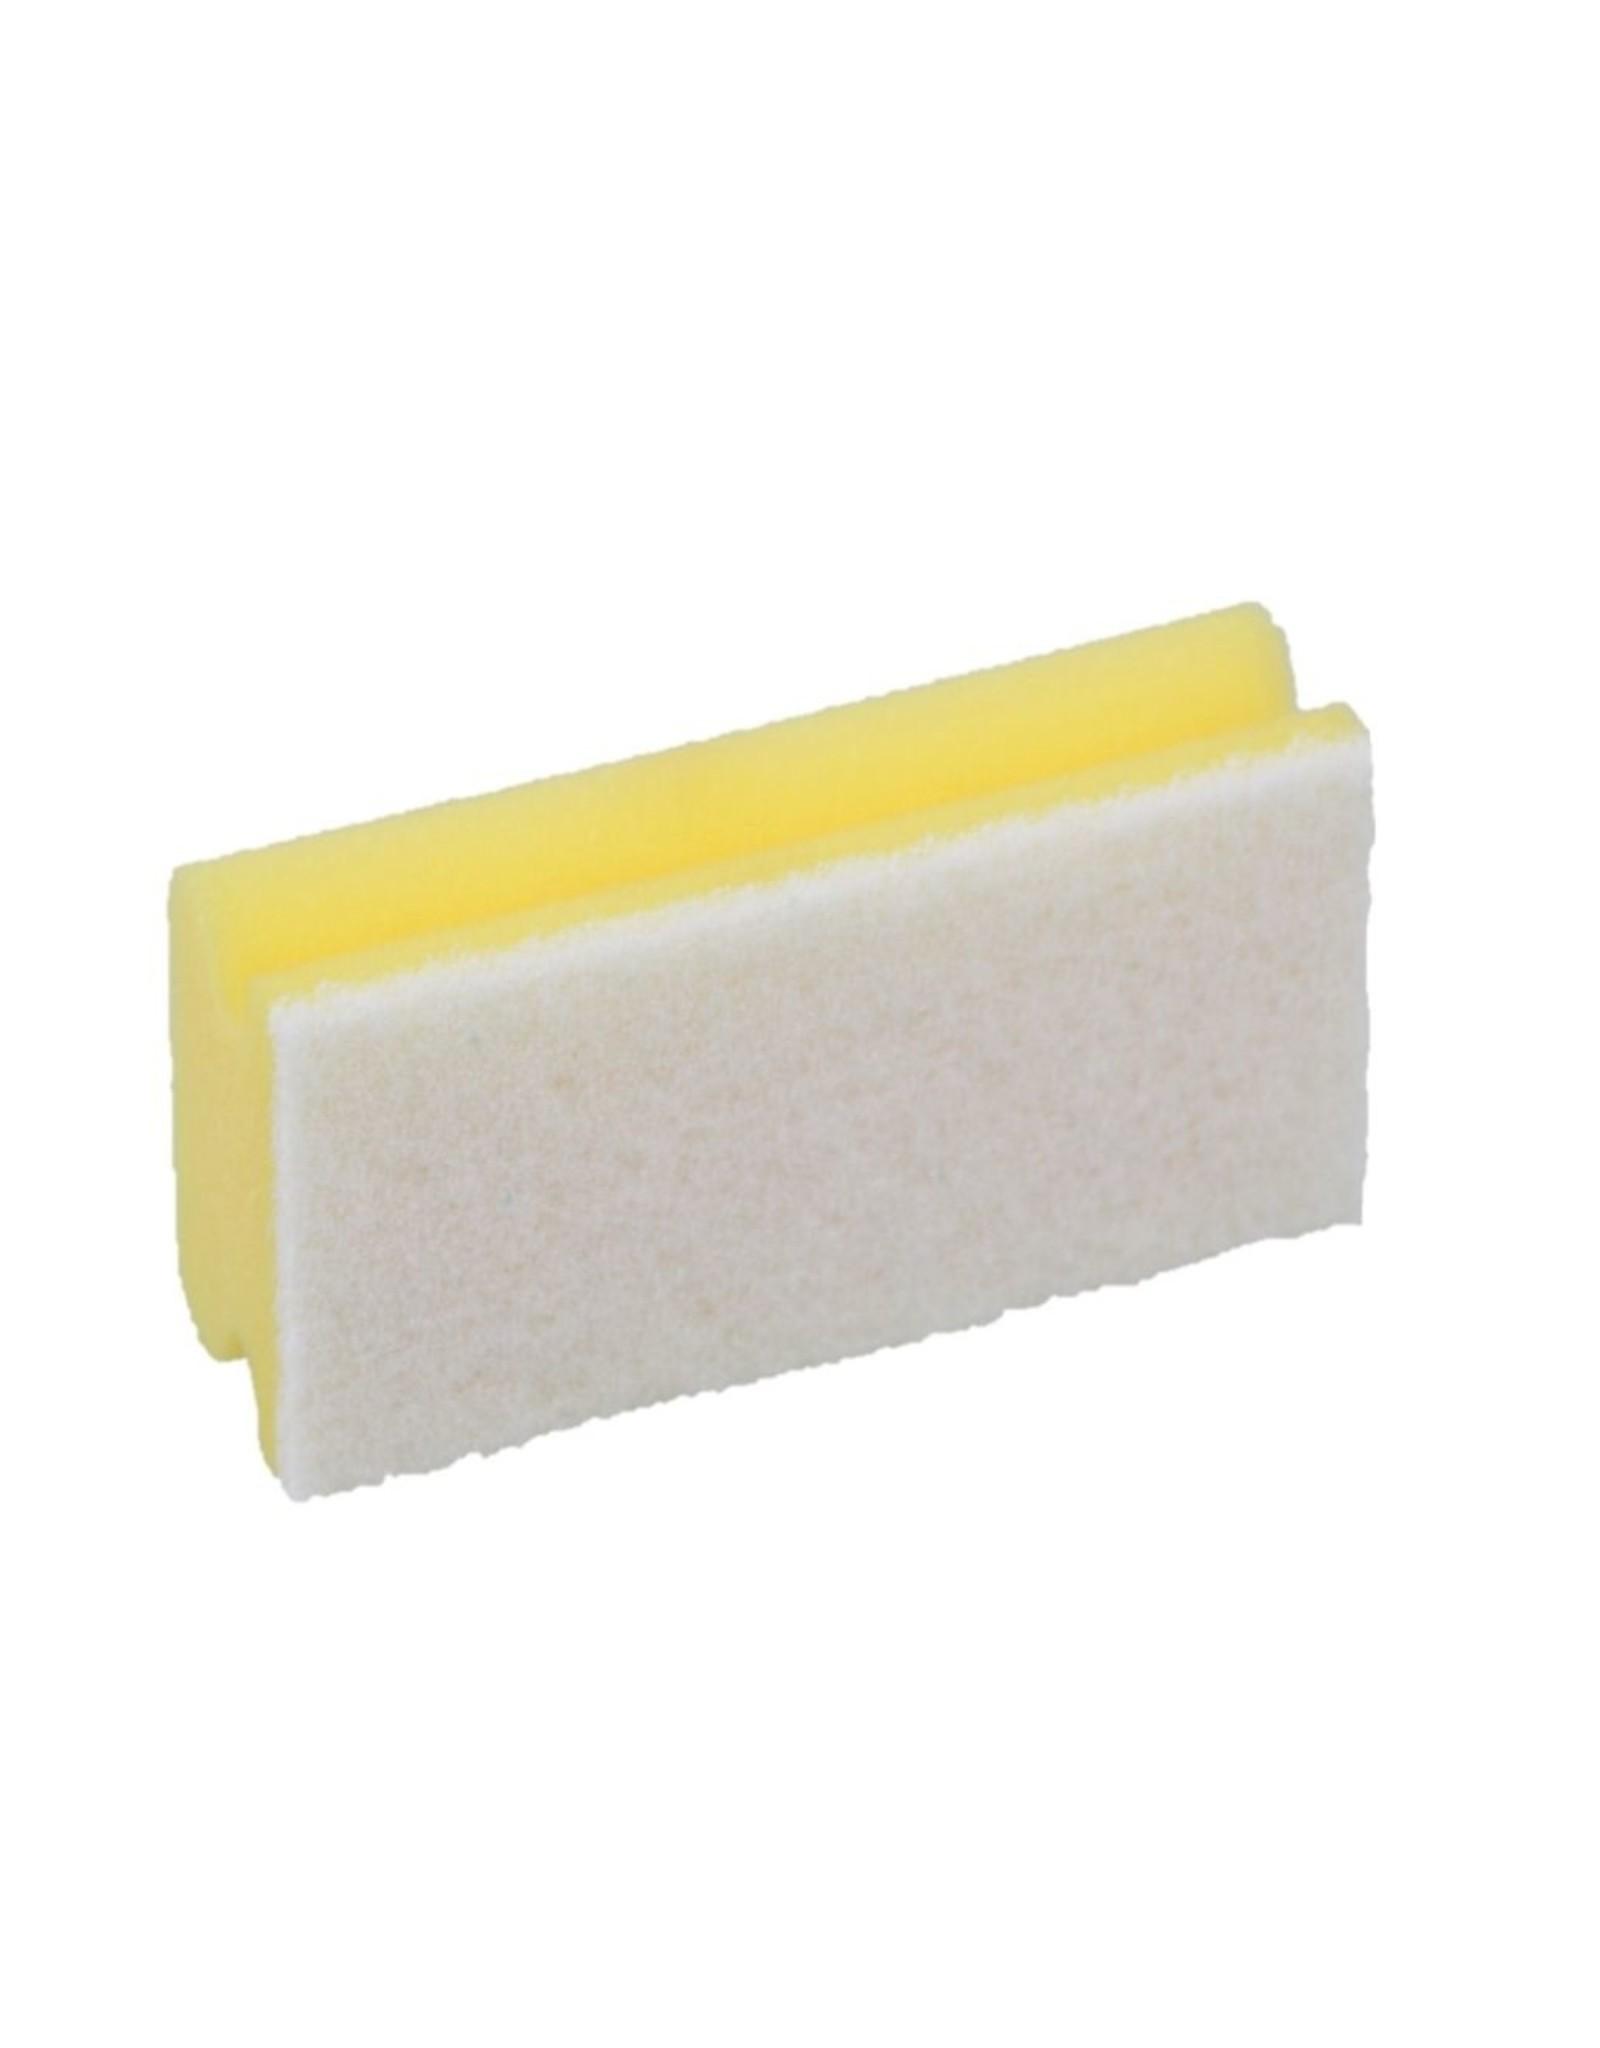 Spons m.greep. 7x14,5x4,3cm. geel witte krasvrije pad (5st.)